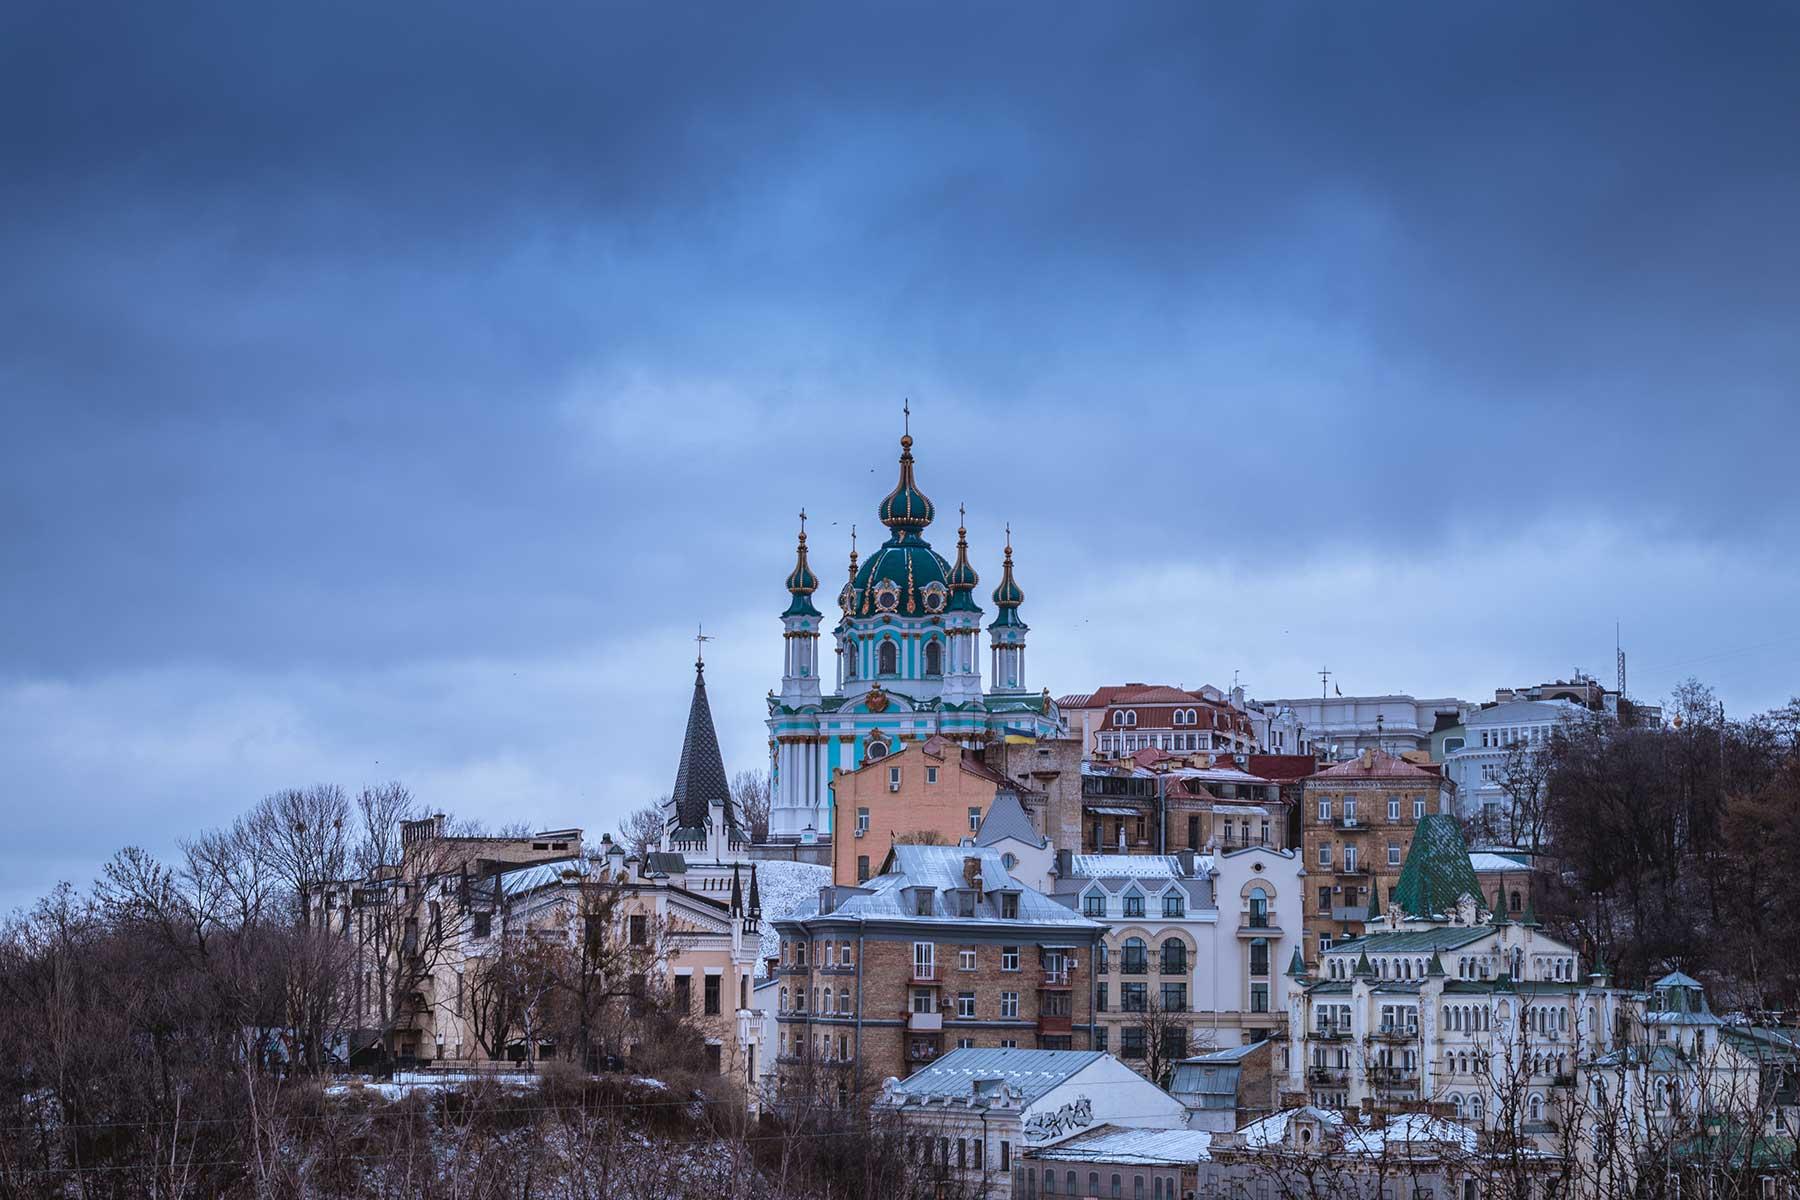 Resor-till-Ukraine-stadsbild-Kiev-Nygren-LInd-Resebyrå